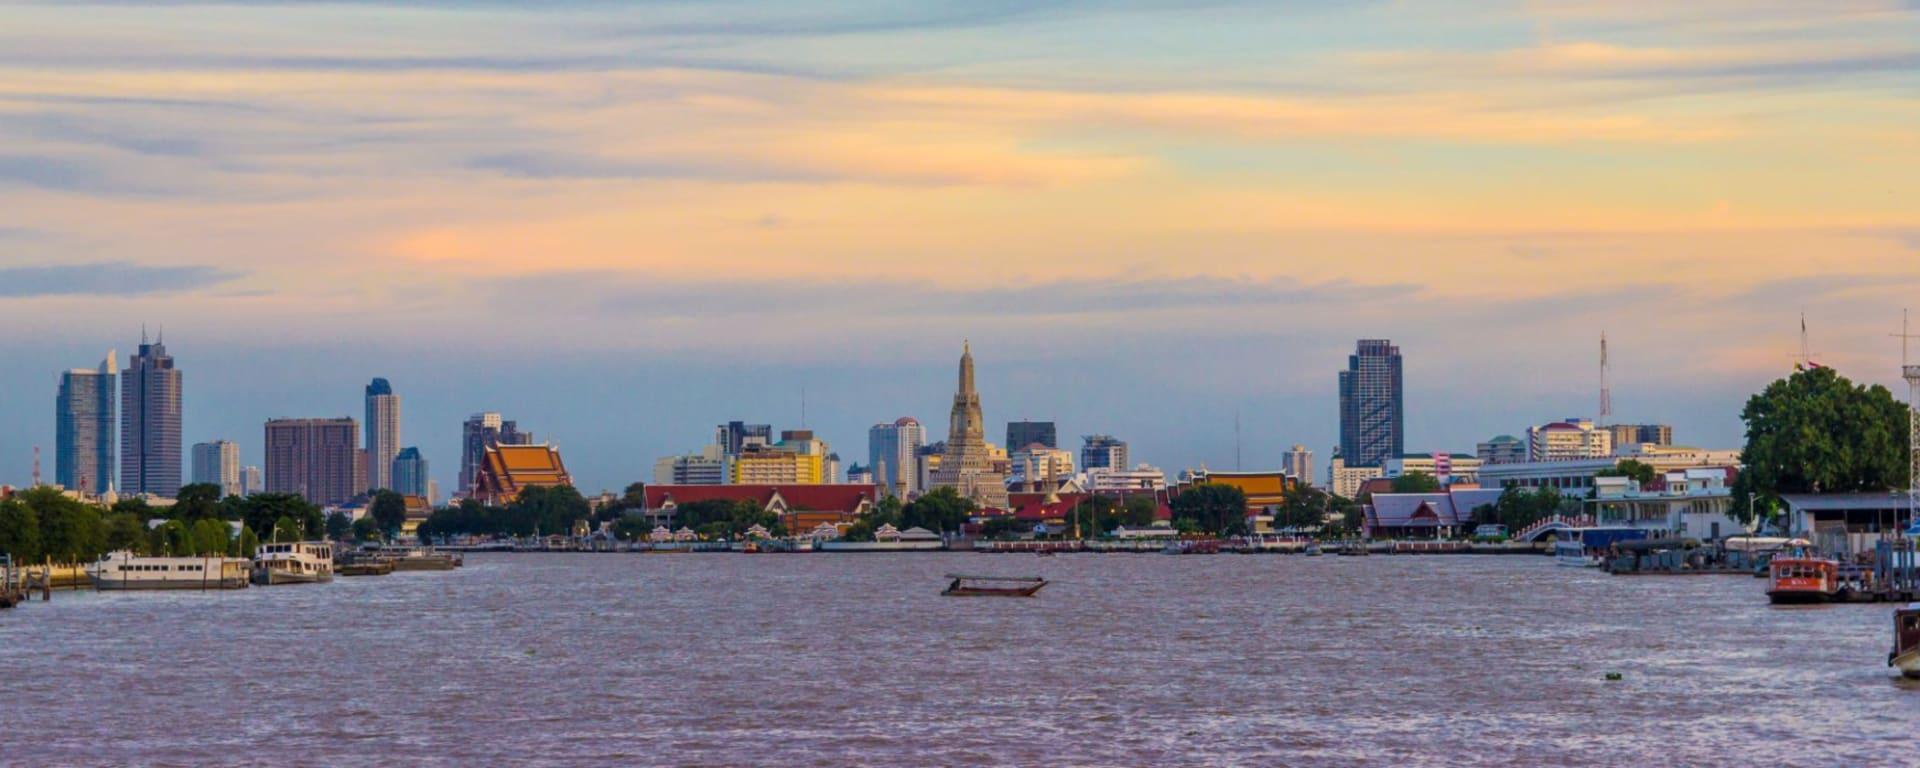 Streifzug durch Bangkoks Umgebung: Bangkok Chao Phraya River